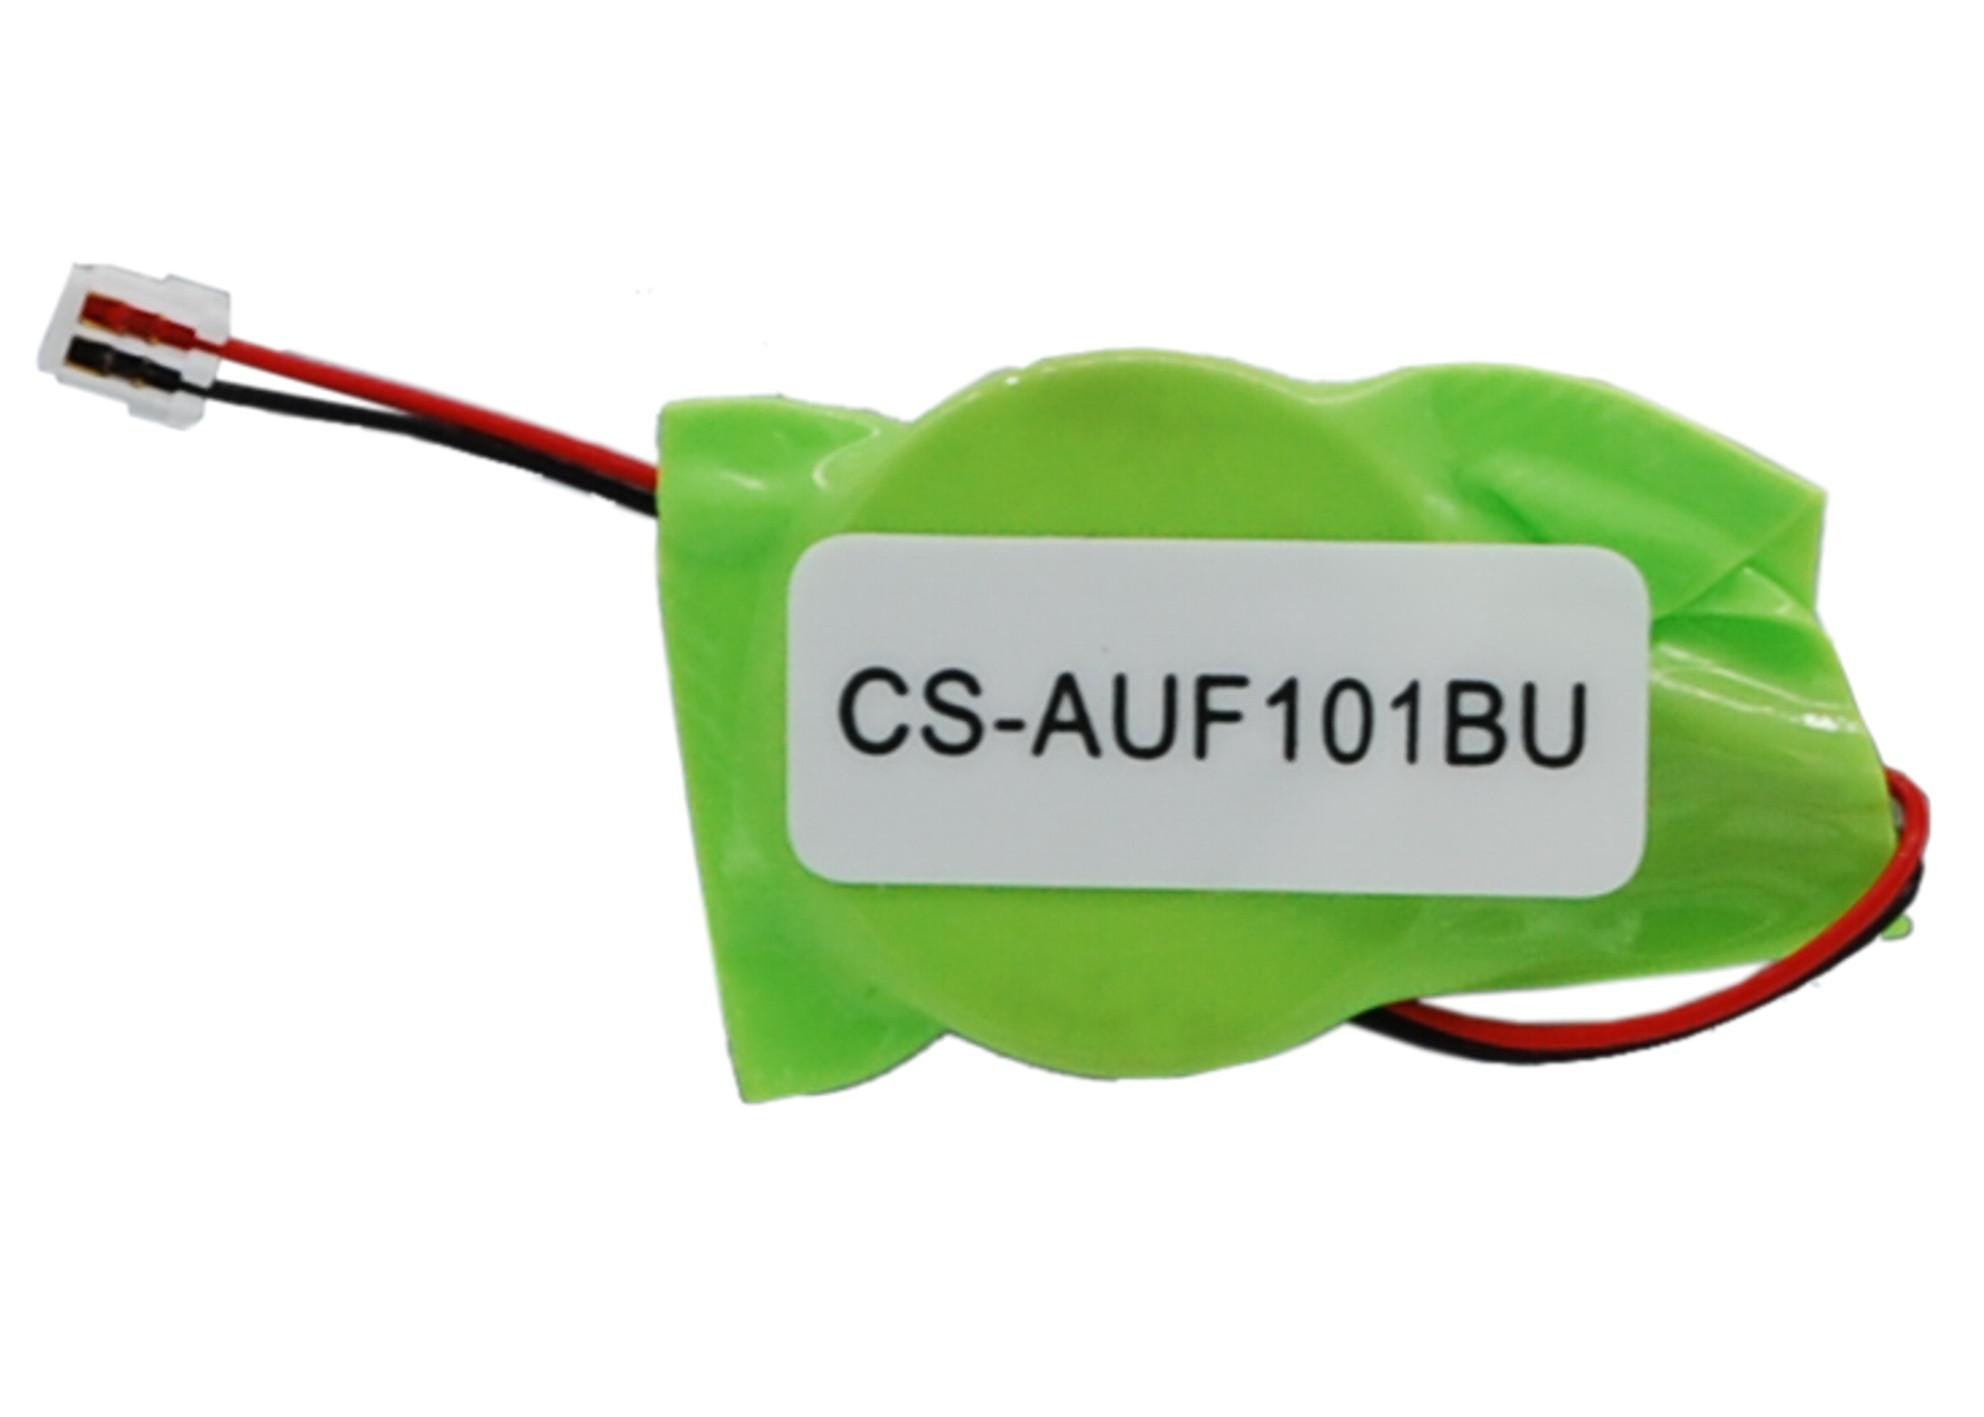 Cameron Sino baterie cmos pro ASUS Eee Pad Transformer TF101-1B100A 3V Li-ion 40mAh zelená - neoriginální